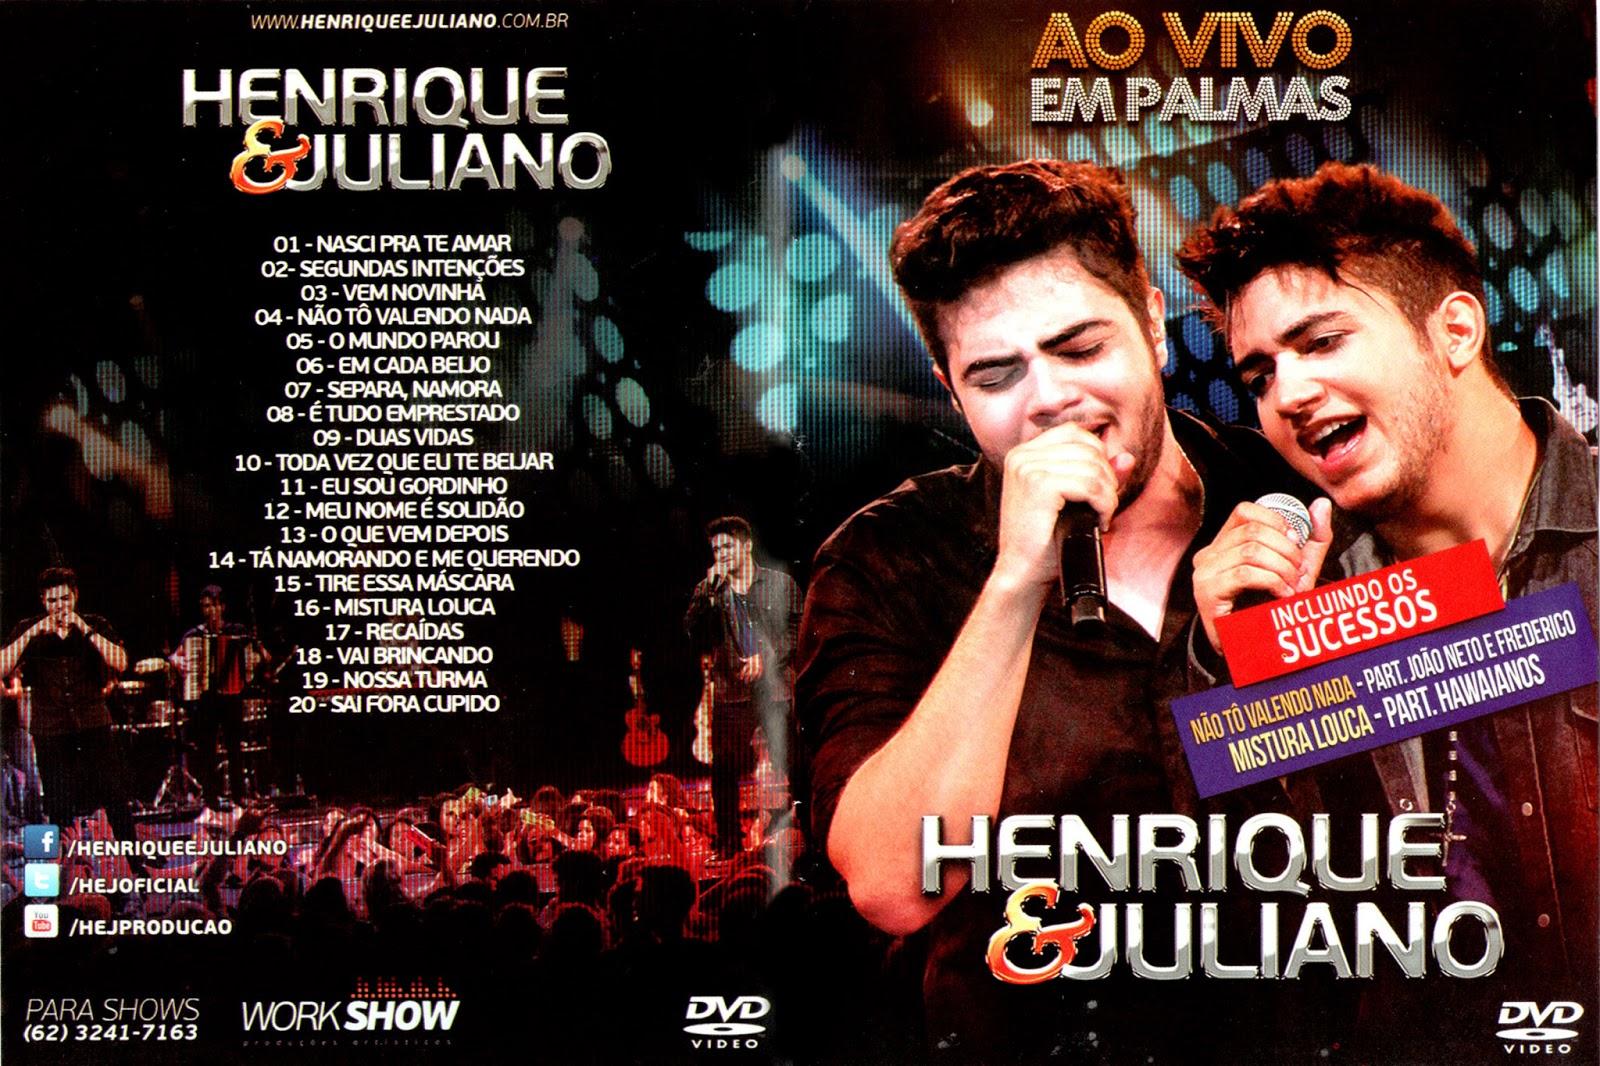 Henrique & Juliano Ao Vivo em Palmas DVDRip XviD 2014